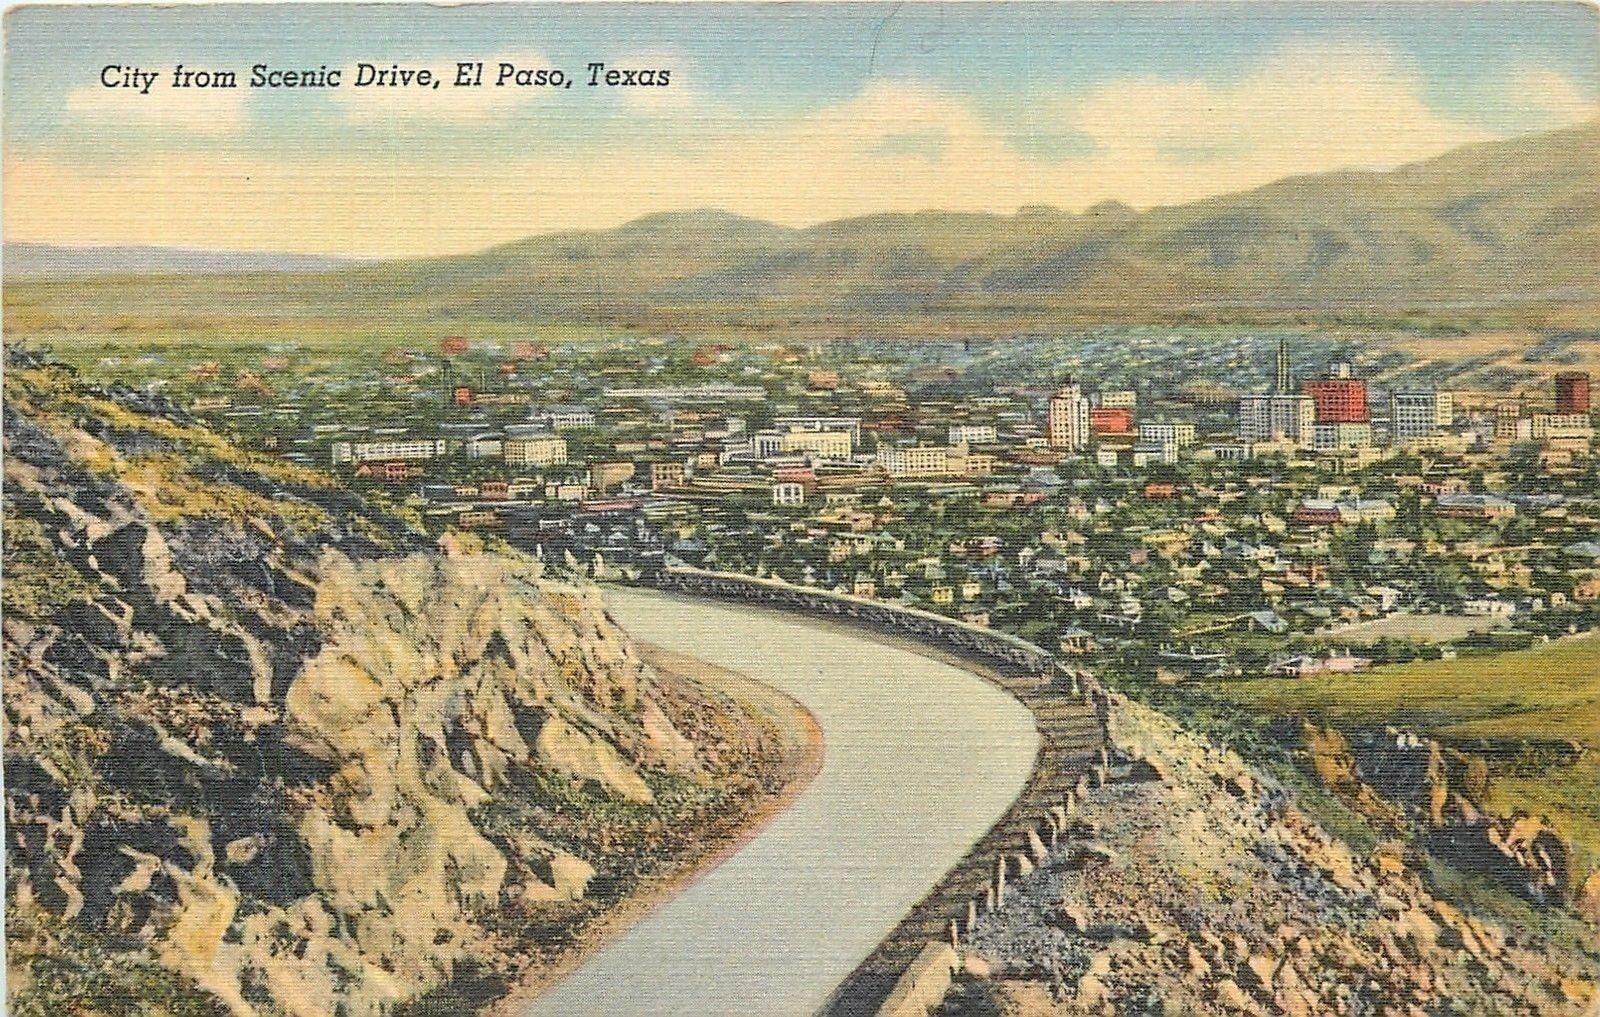 el paso texas highway overlook city